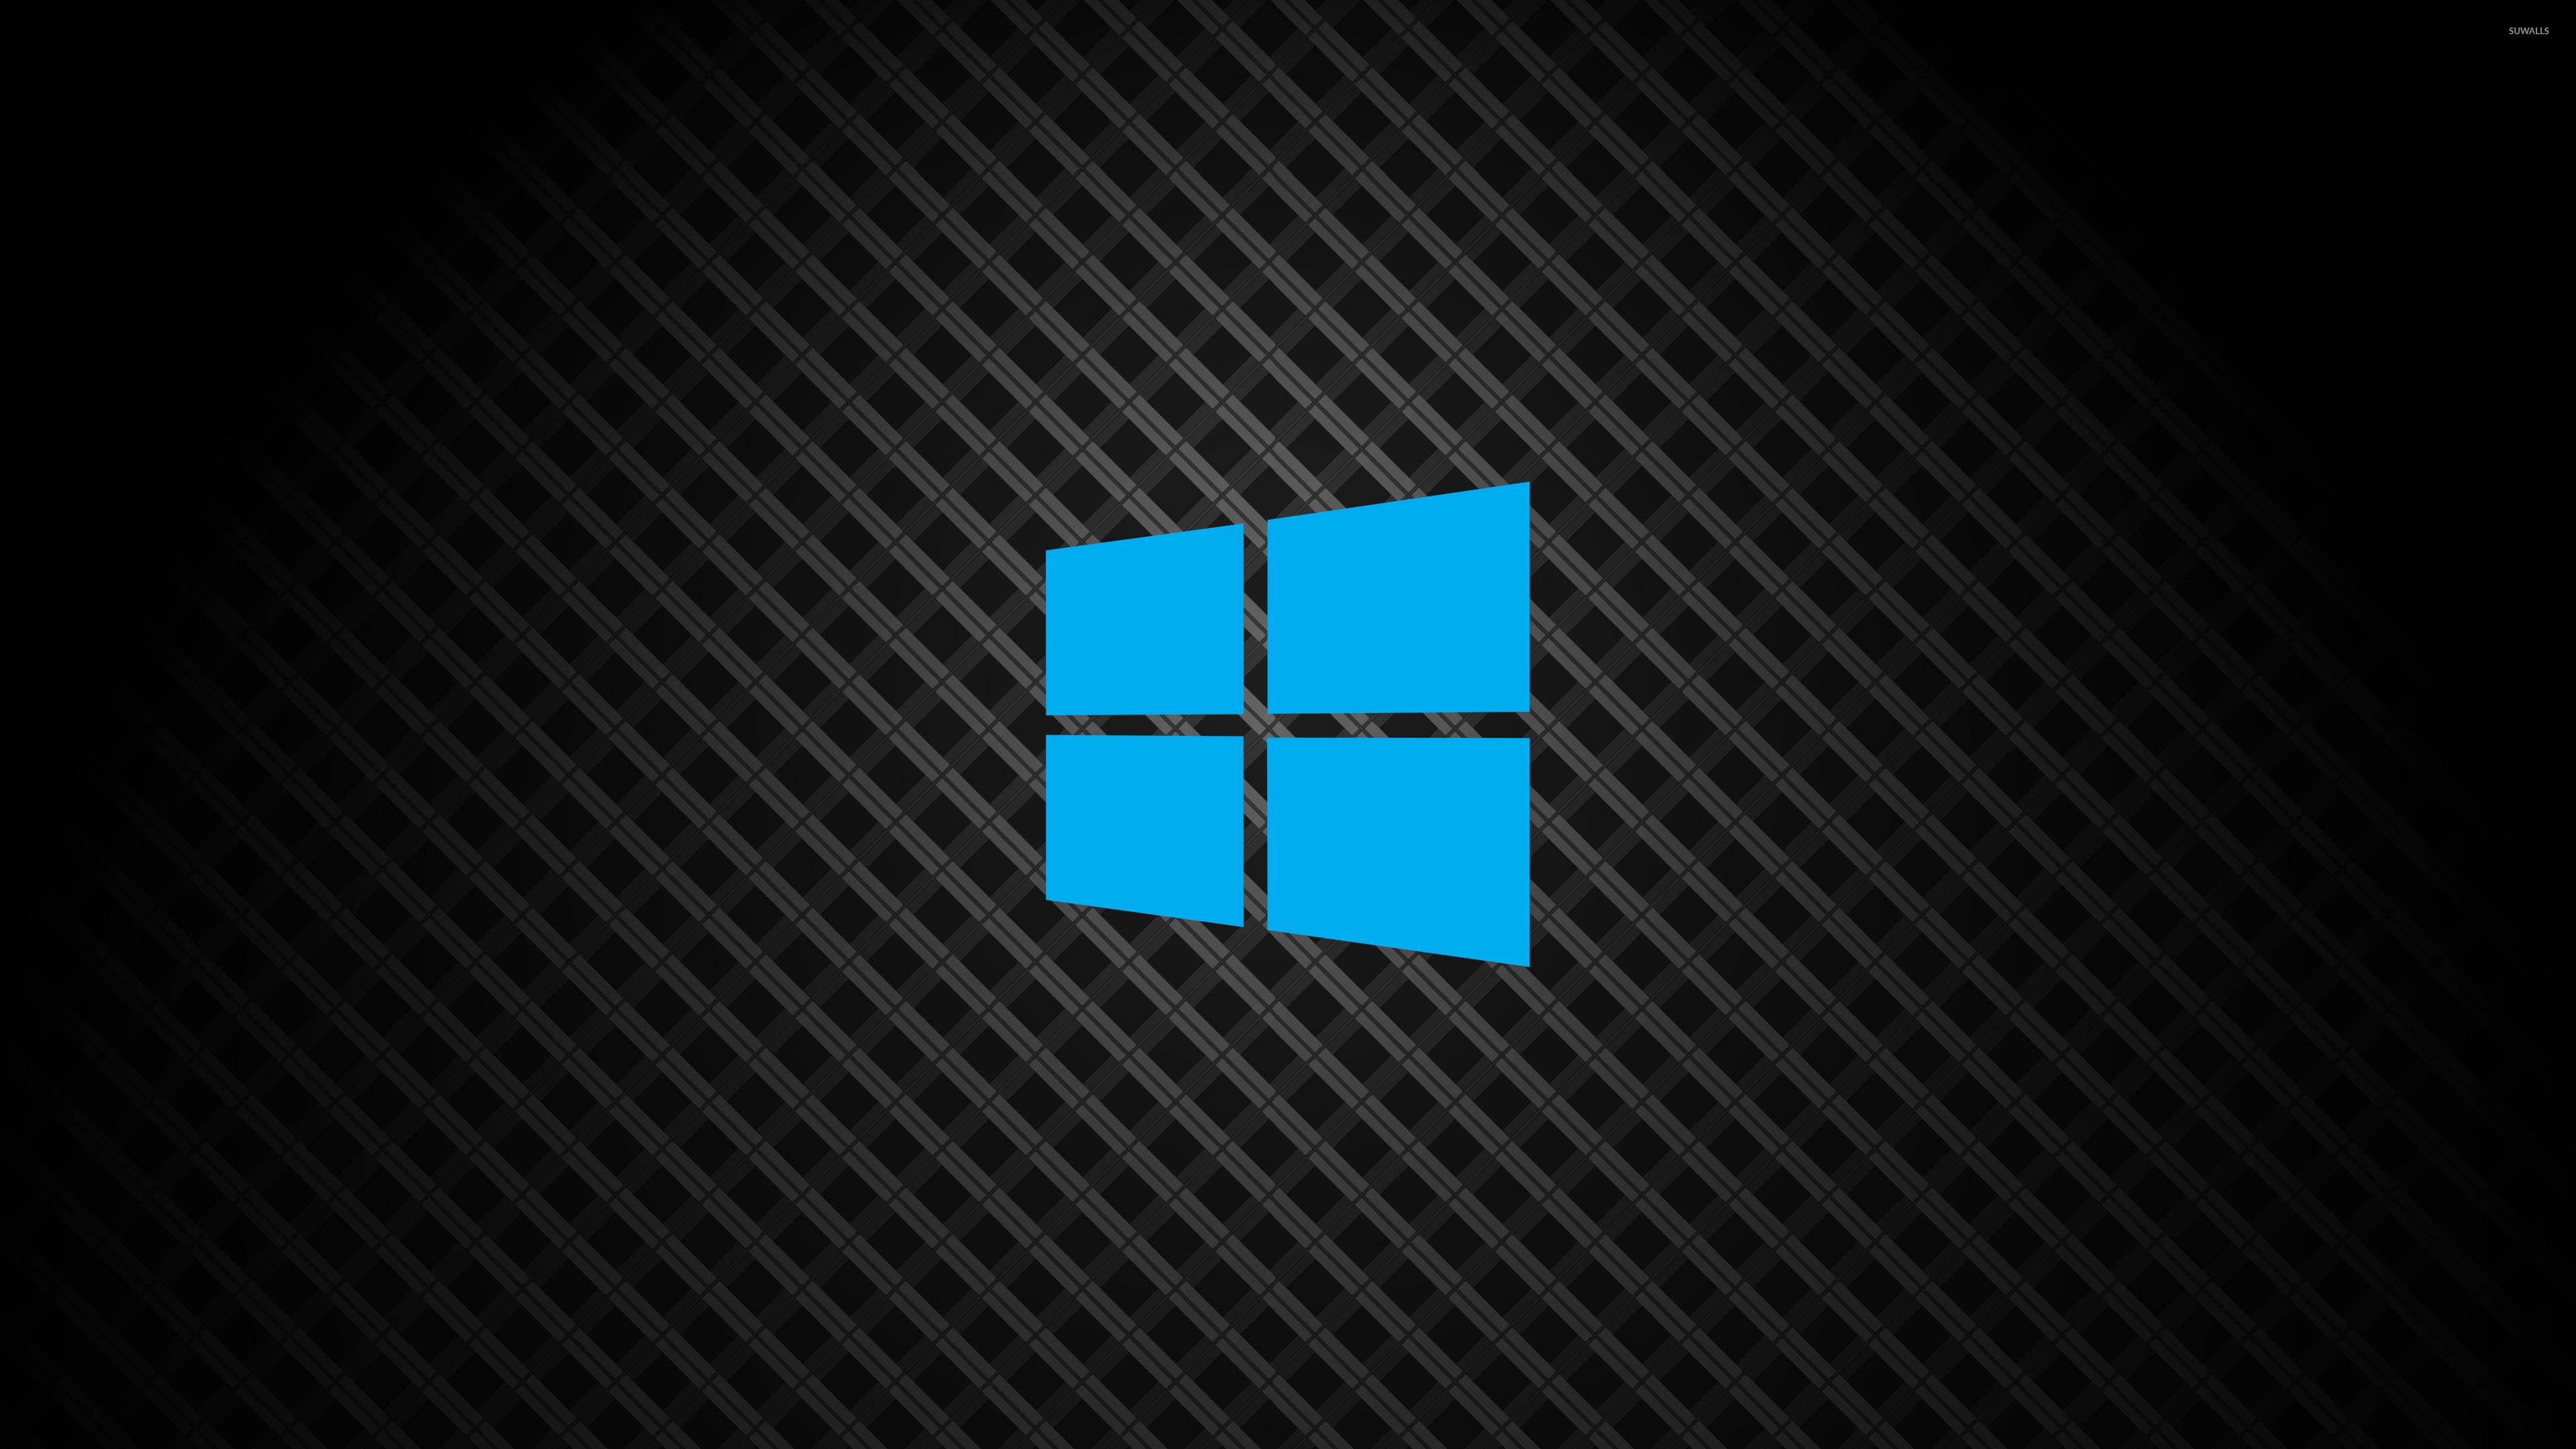 Windows 10 On Square Pattern Simple Blue Logo Wallpaper